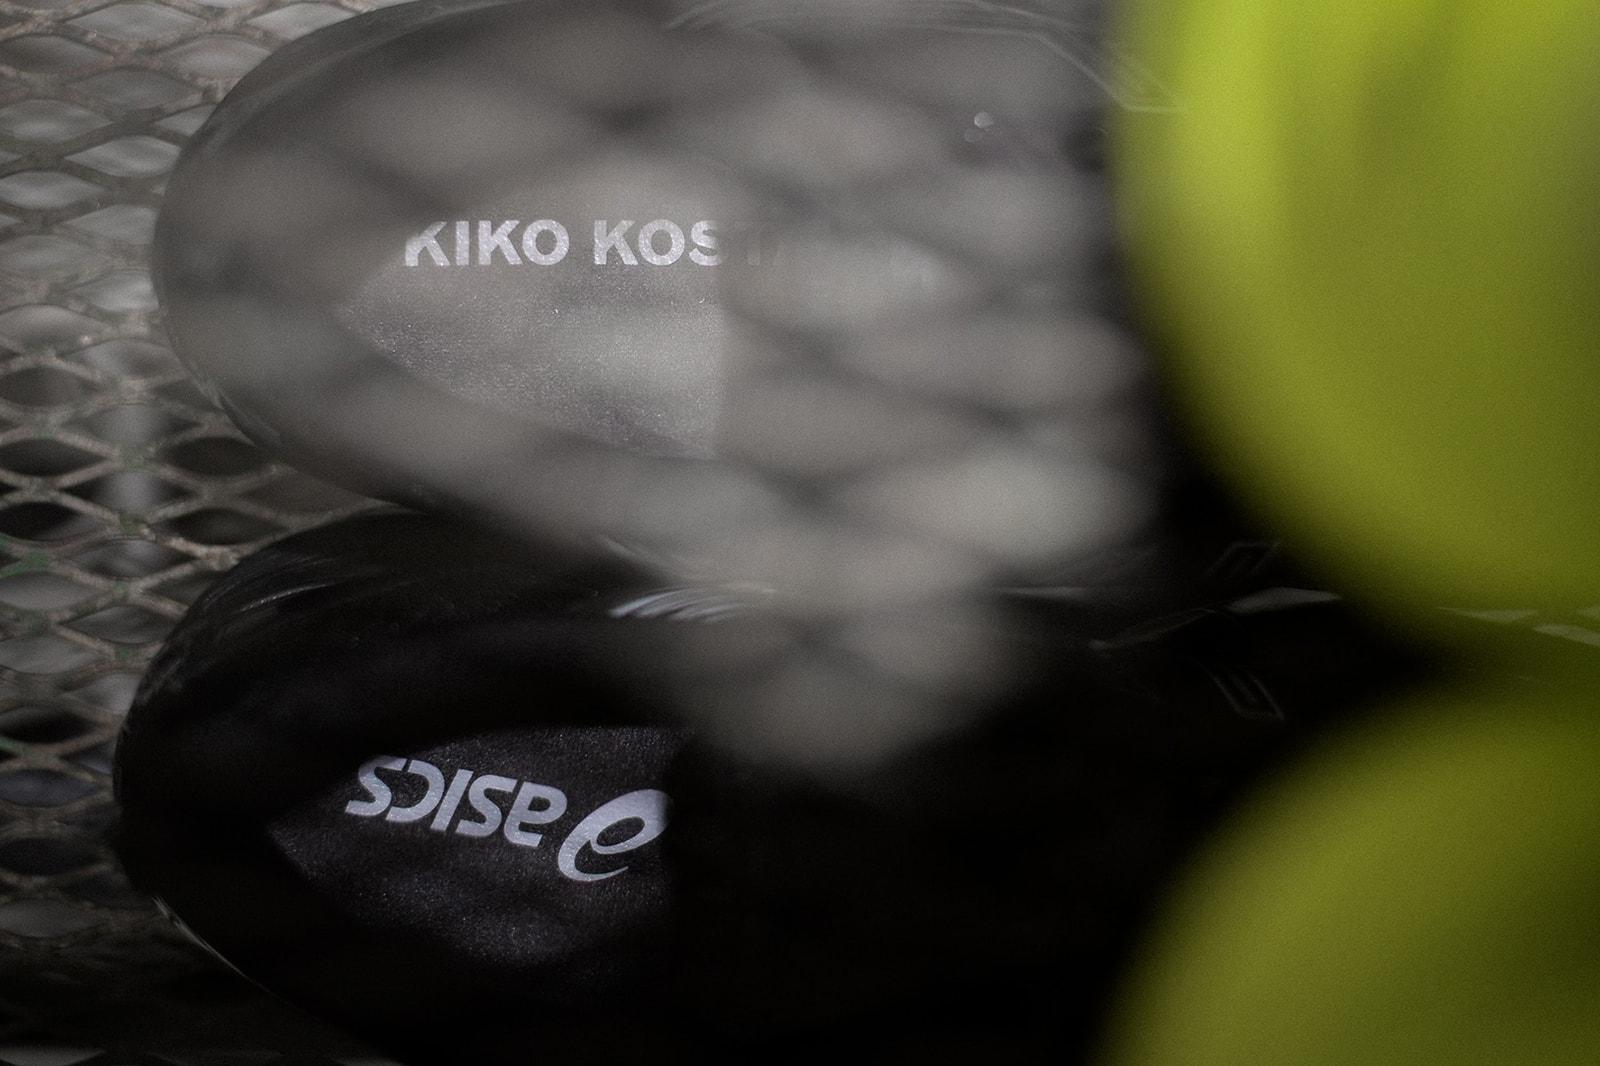 Kiko Kostadinov Interview Dover Street Market Ginza DSM Asics Collaboration